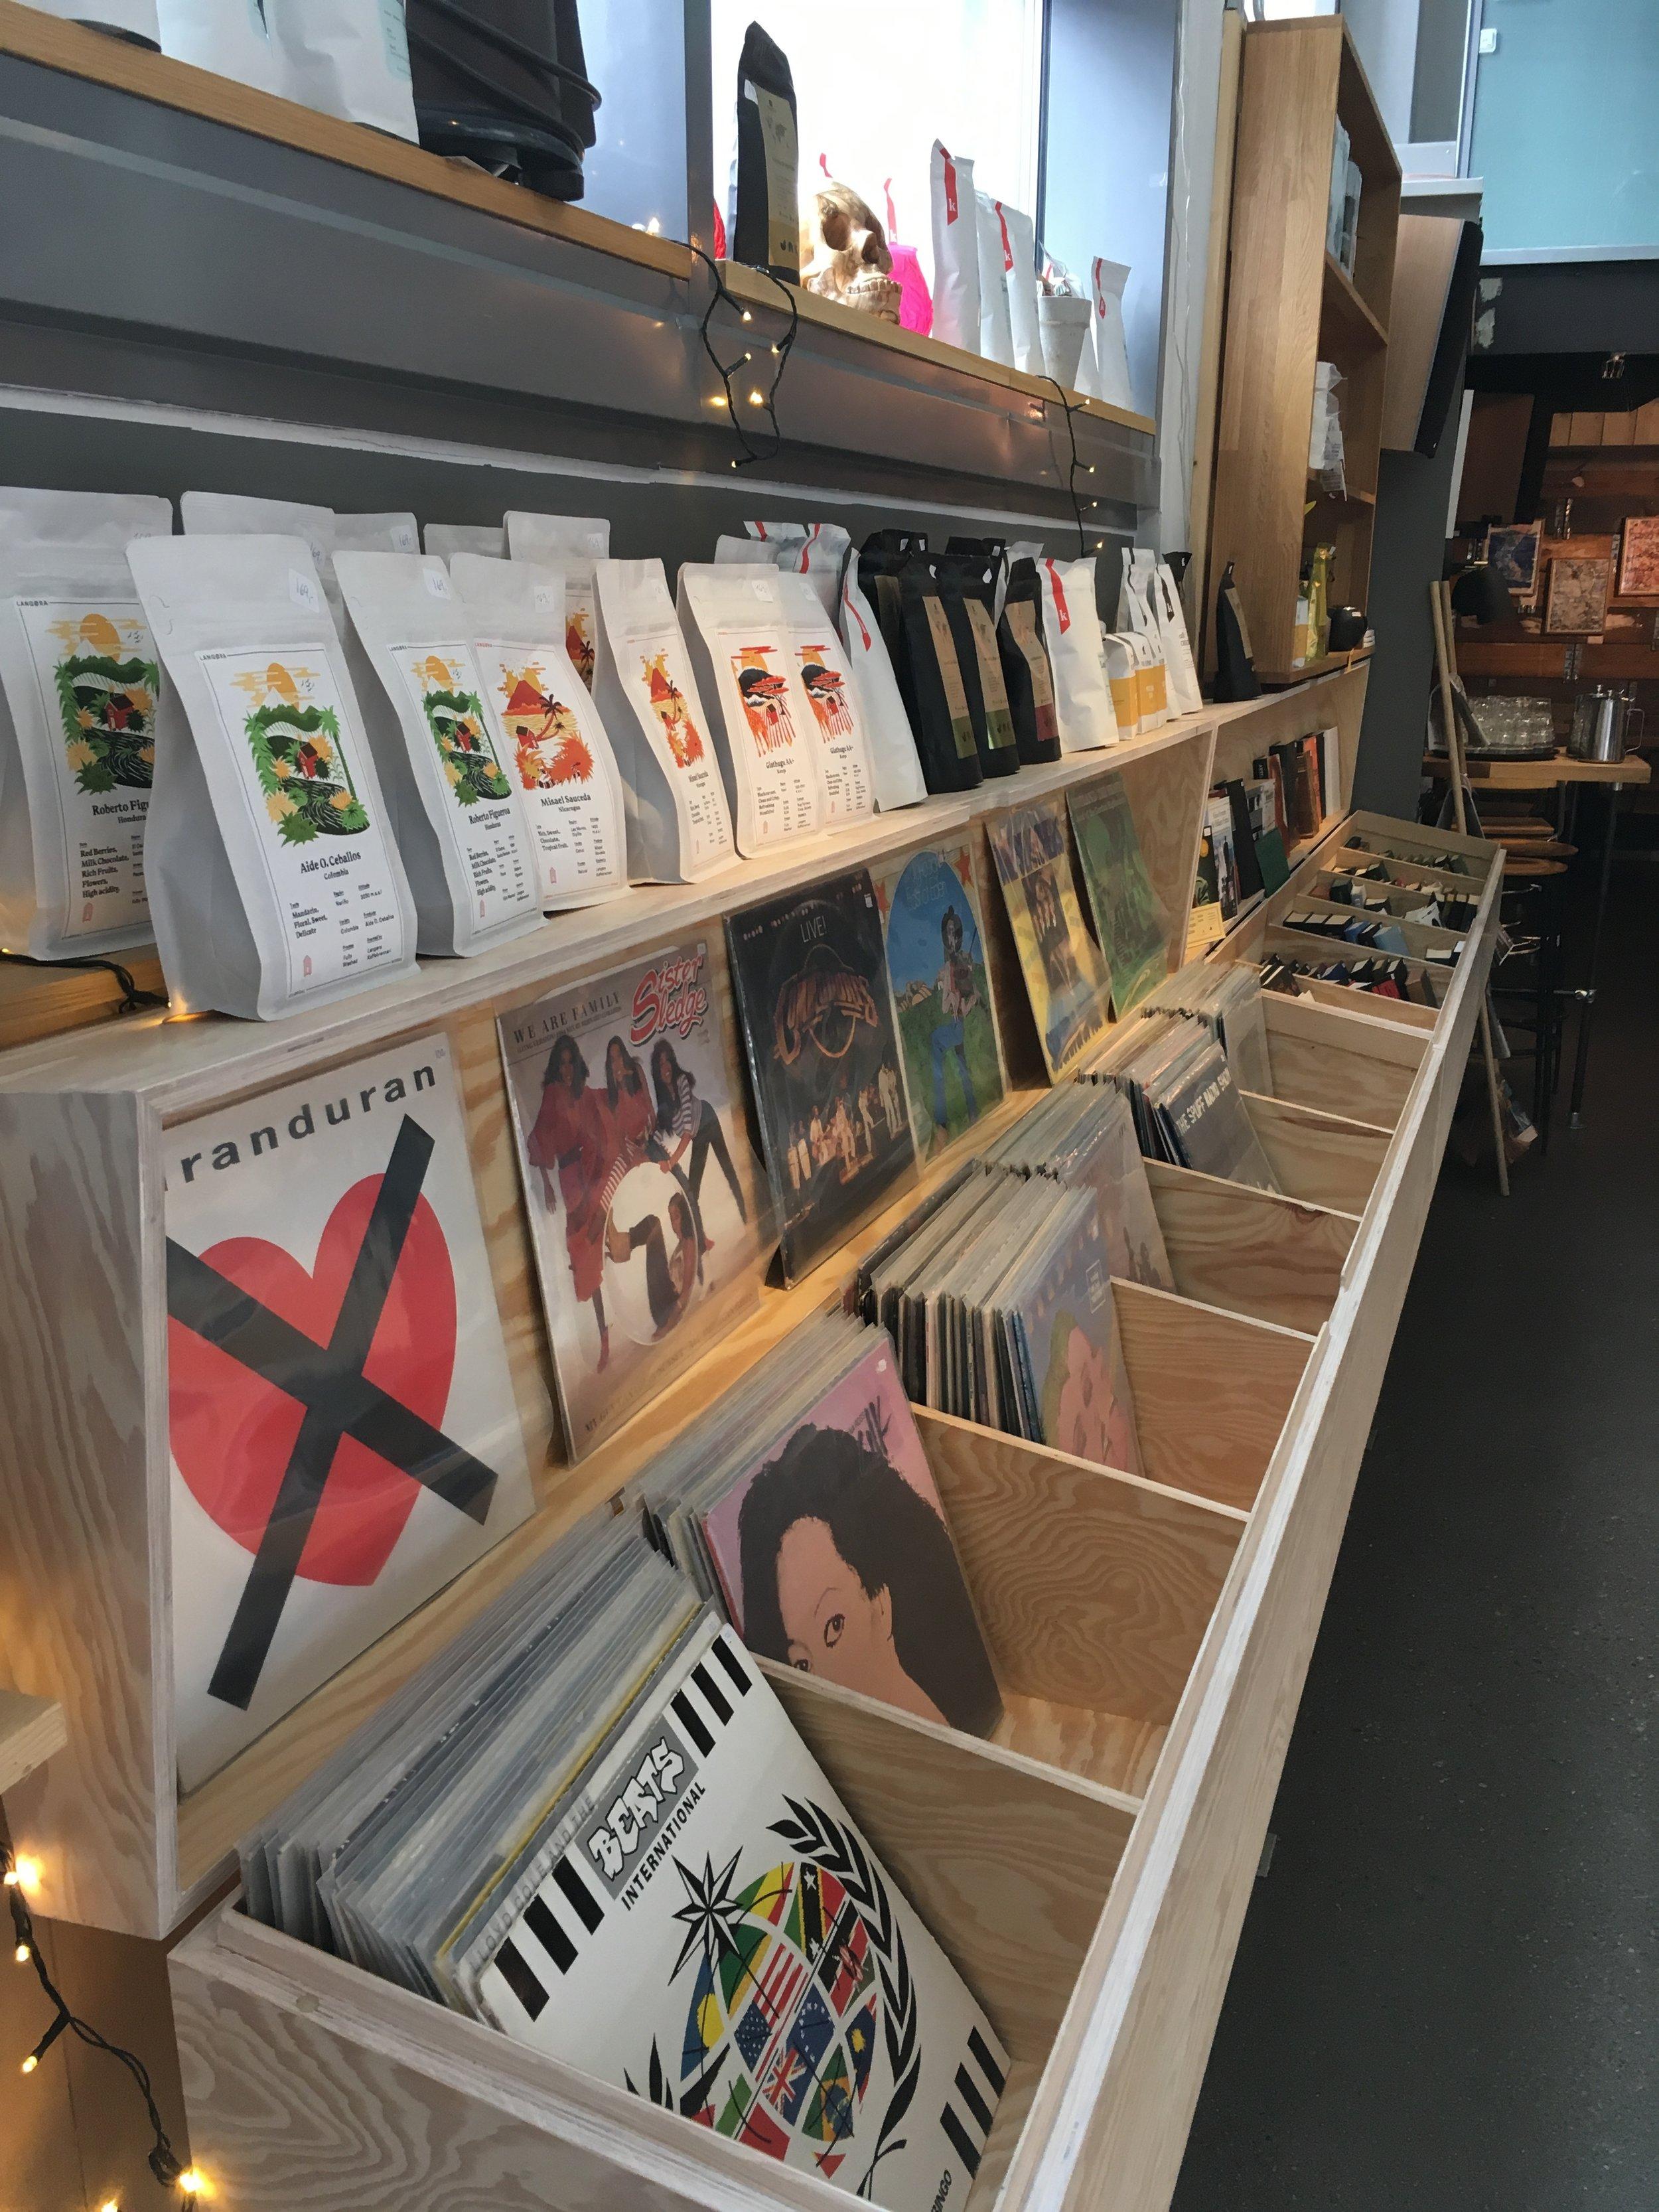 Vinyl, coffee, literature, good stuff.